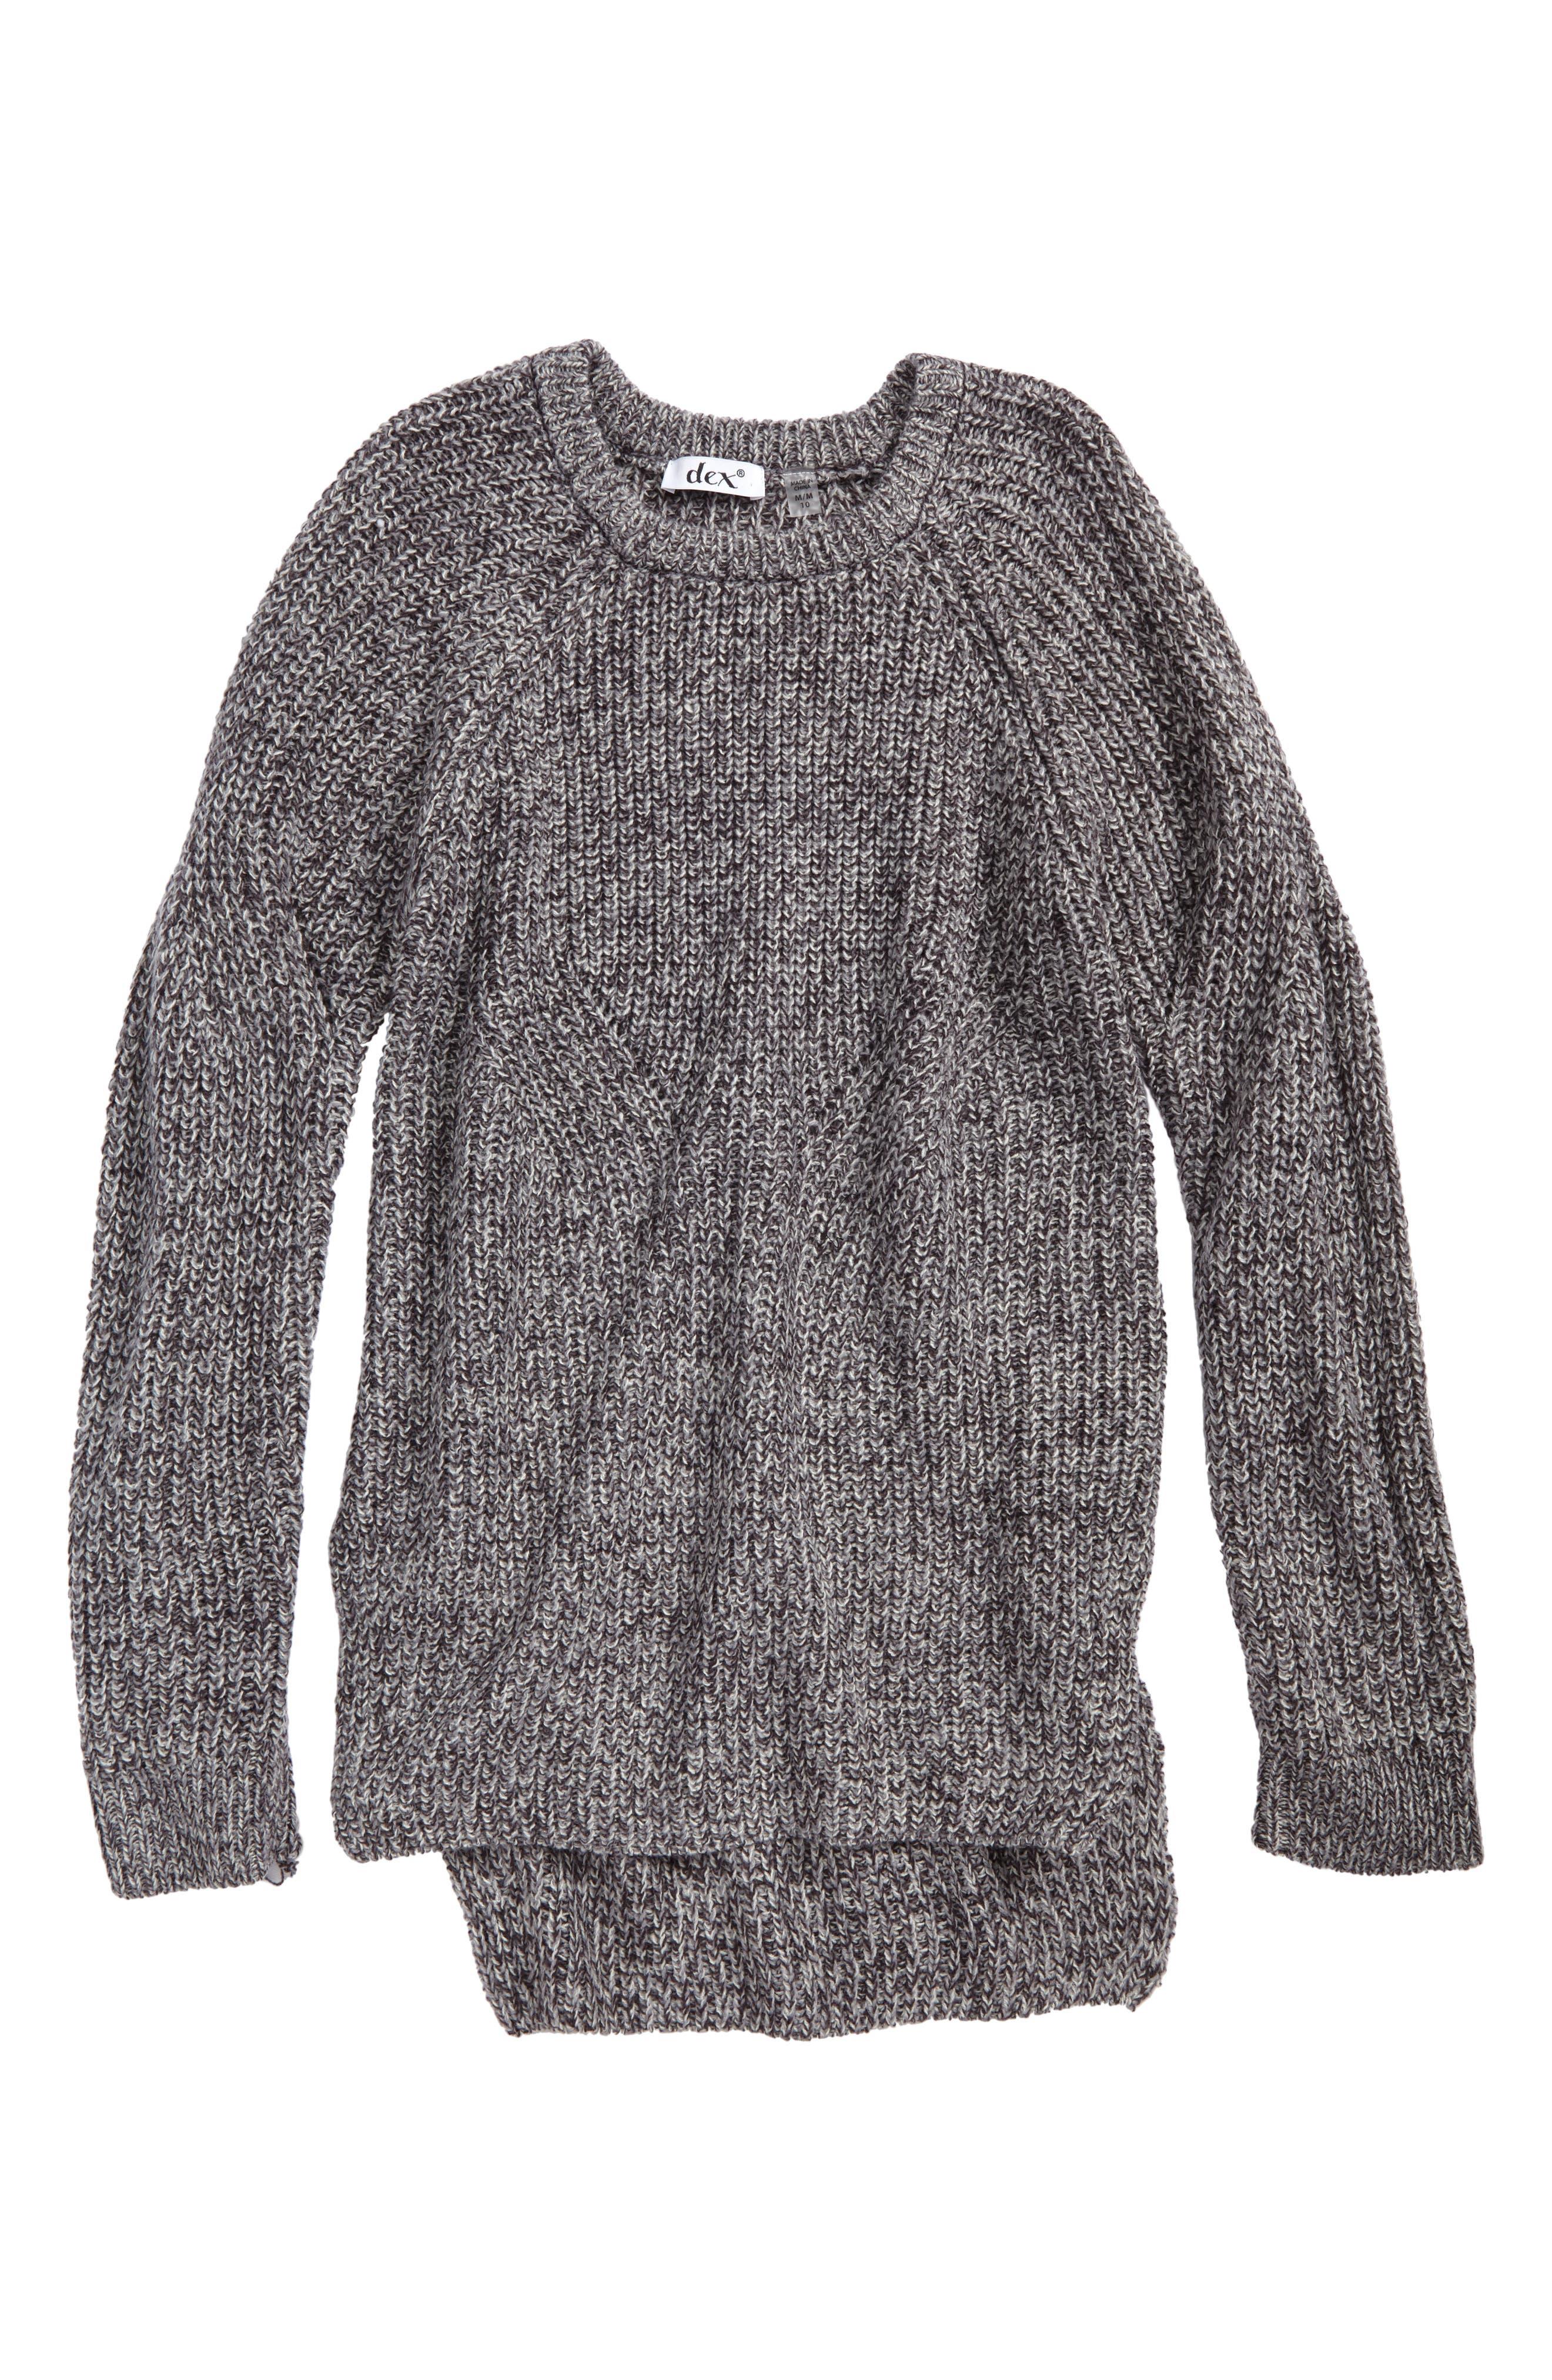 Rib Knit Sweater,                         Main,                         color, 068